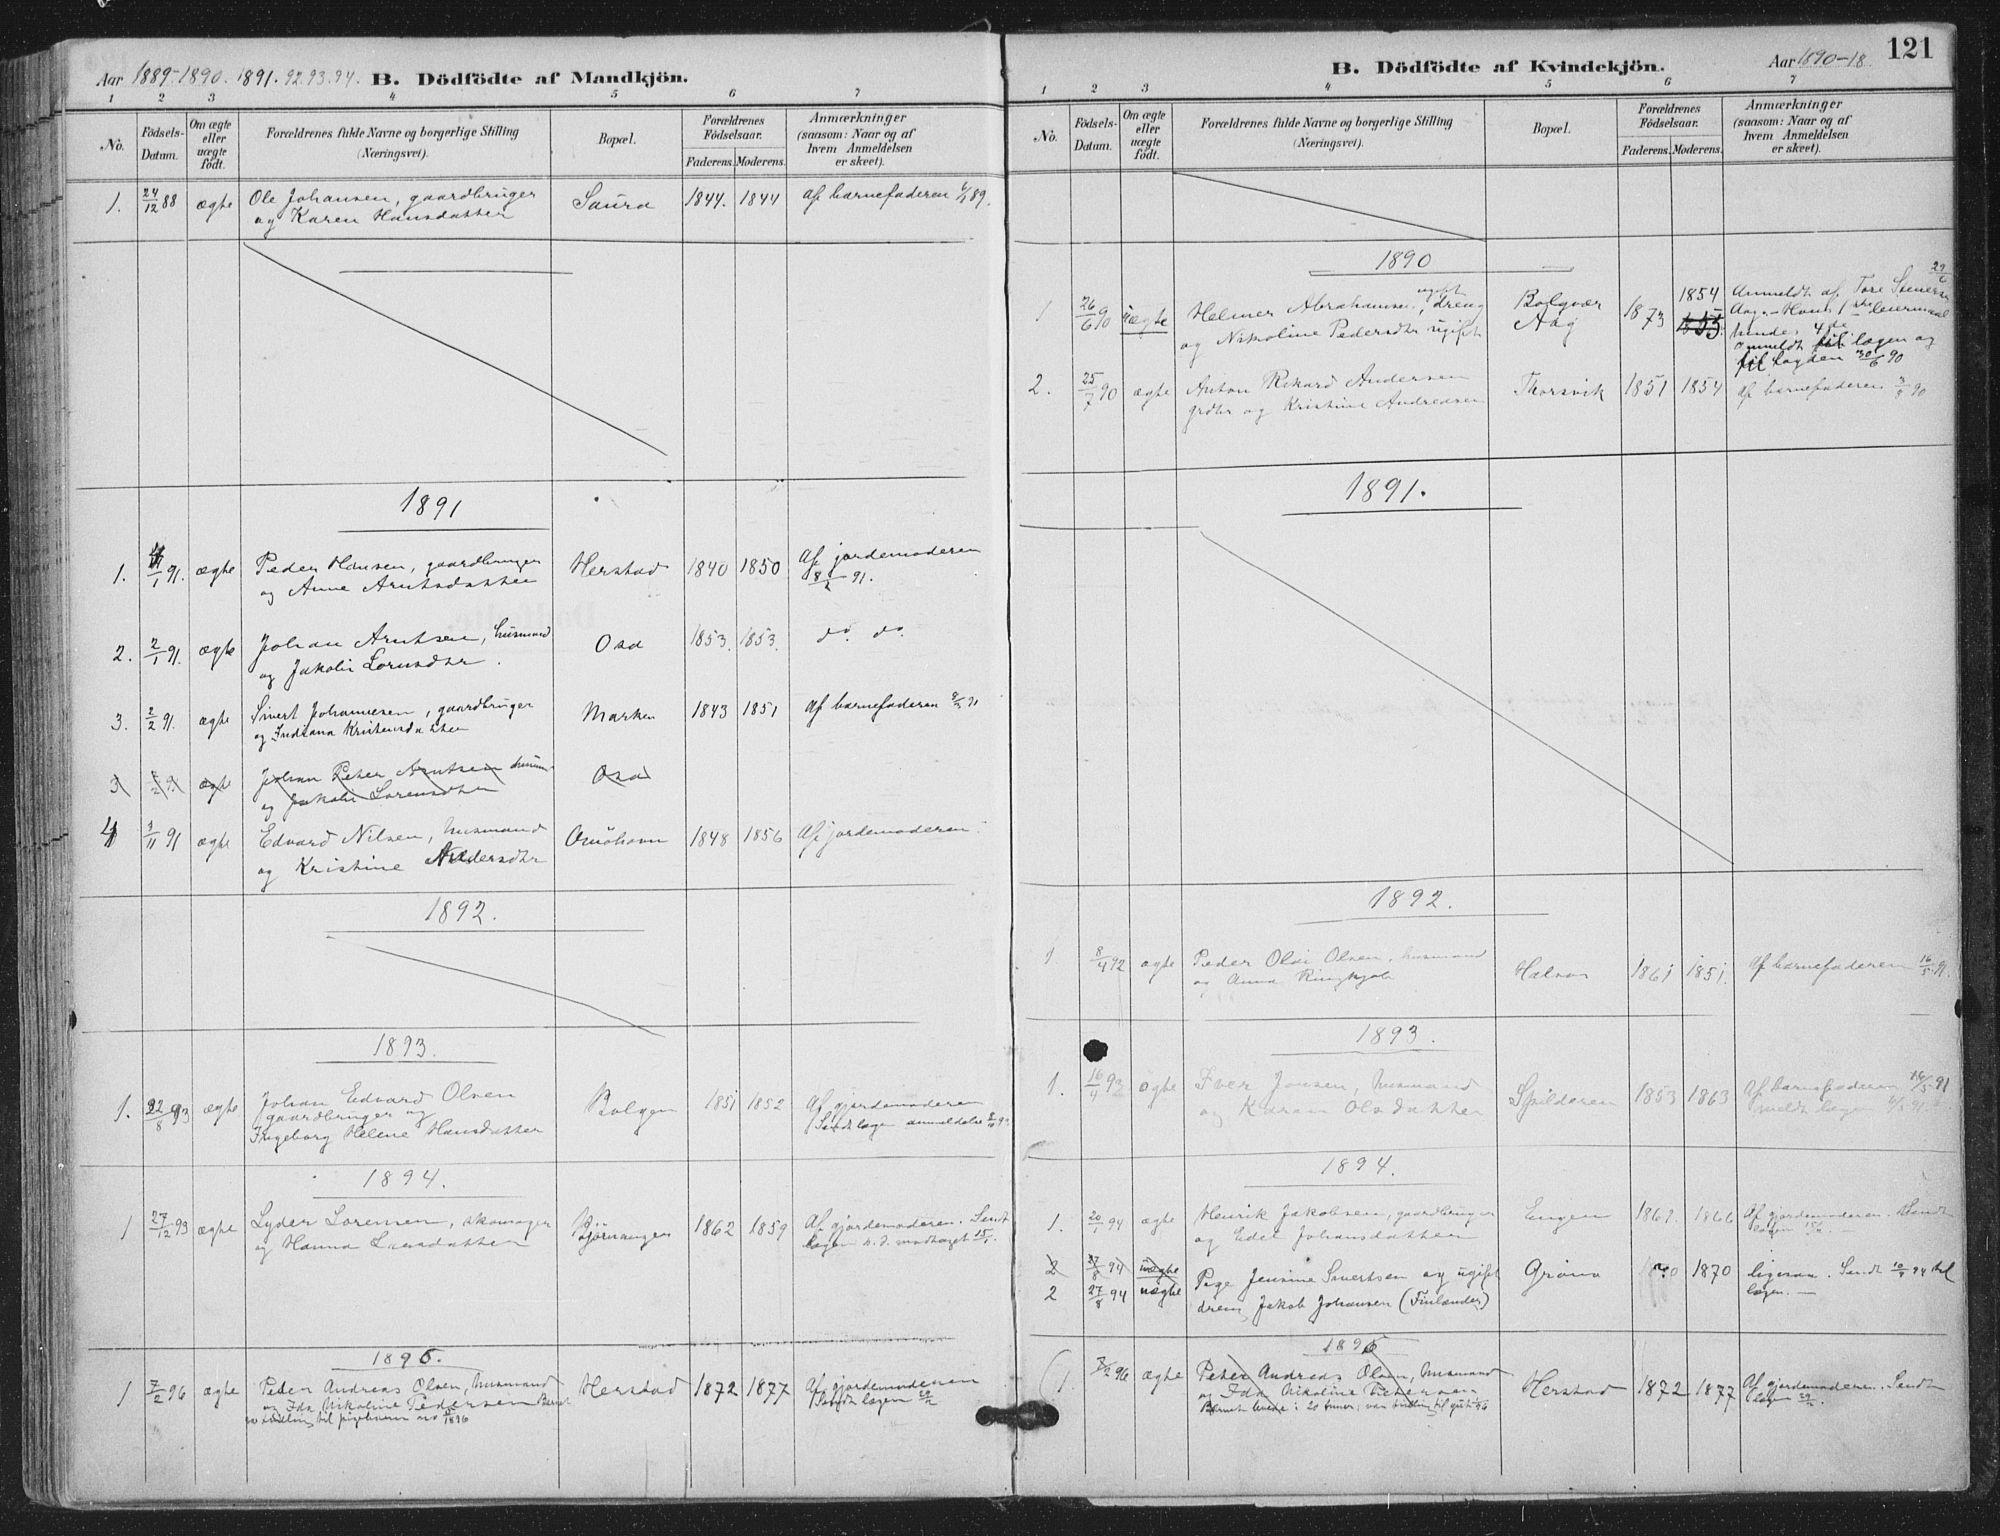 SAT, Ministerialprotokoller, klokkerbøker og fødselsregistre - Nordland, 843/L0628: Ministerialbok nr. 843A03, 1889-1907, s. 121